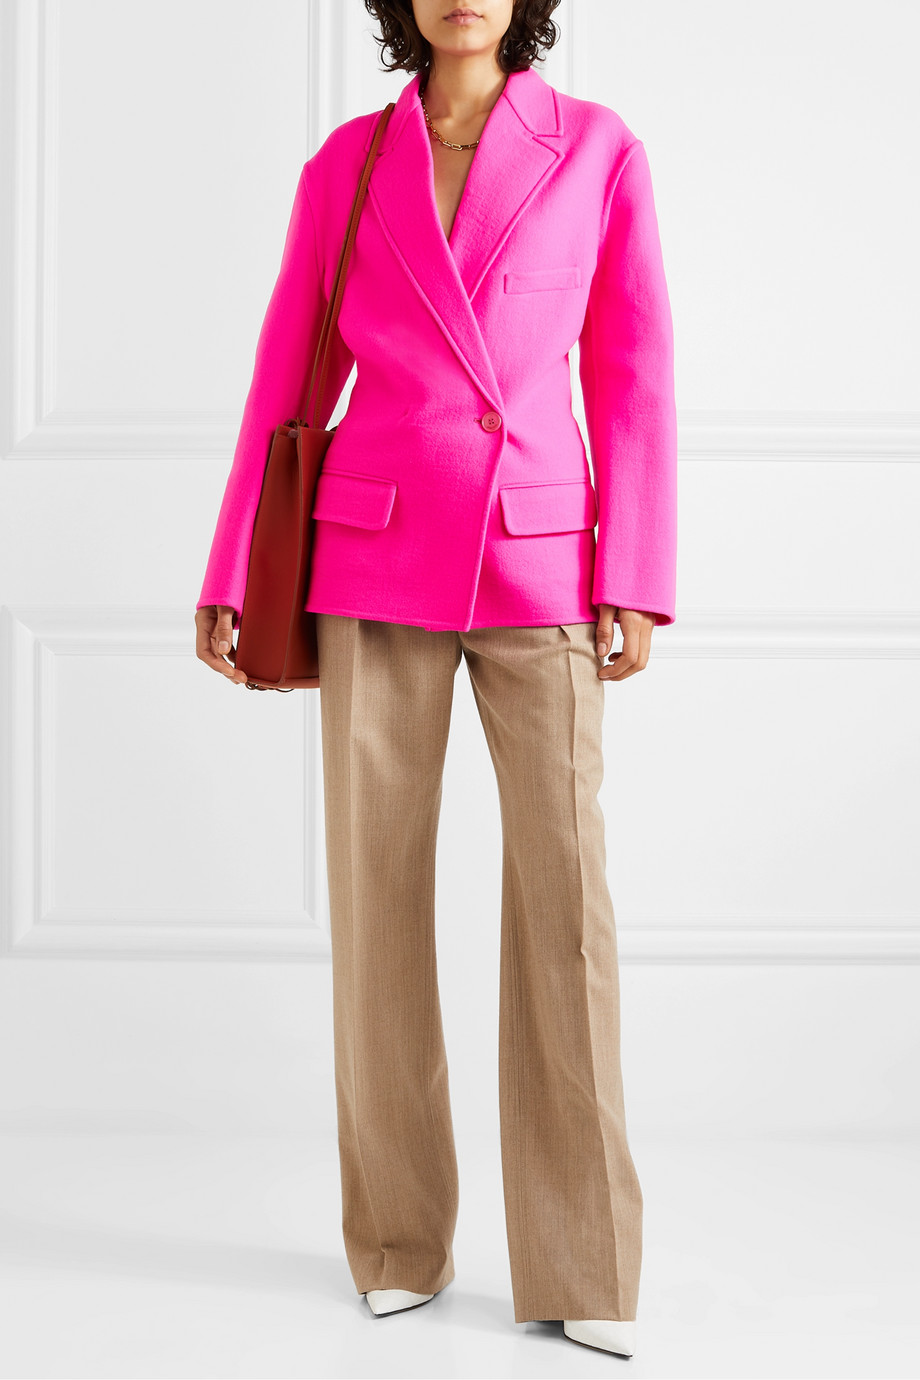 Jacquemus Sabe wool-felt blazer